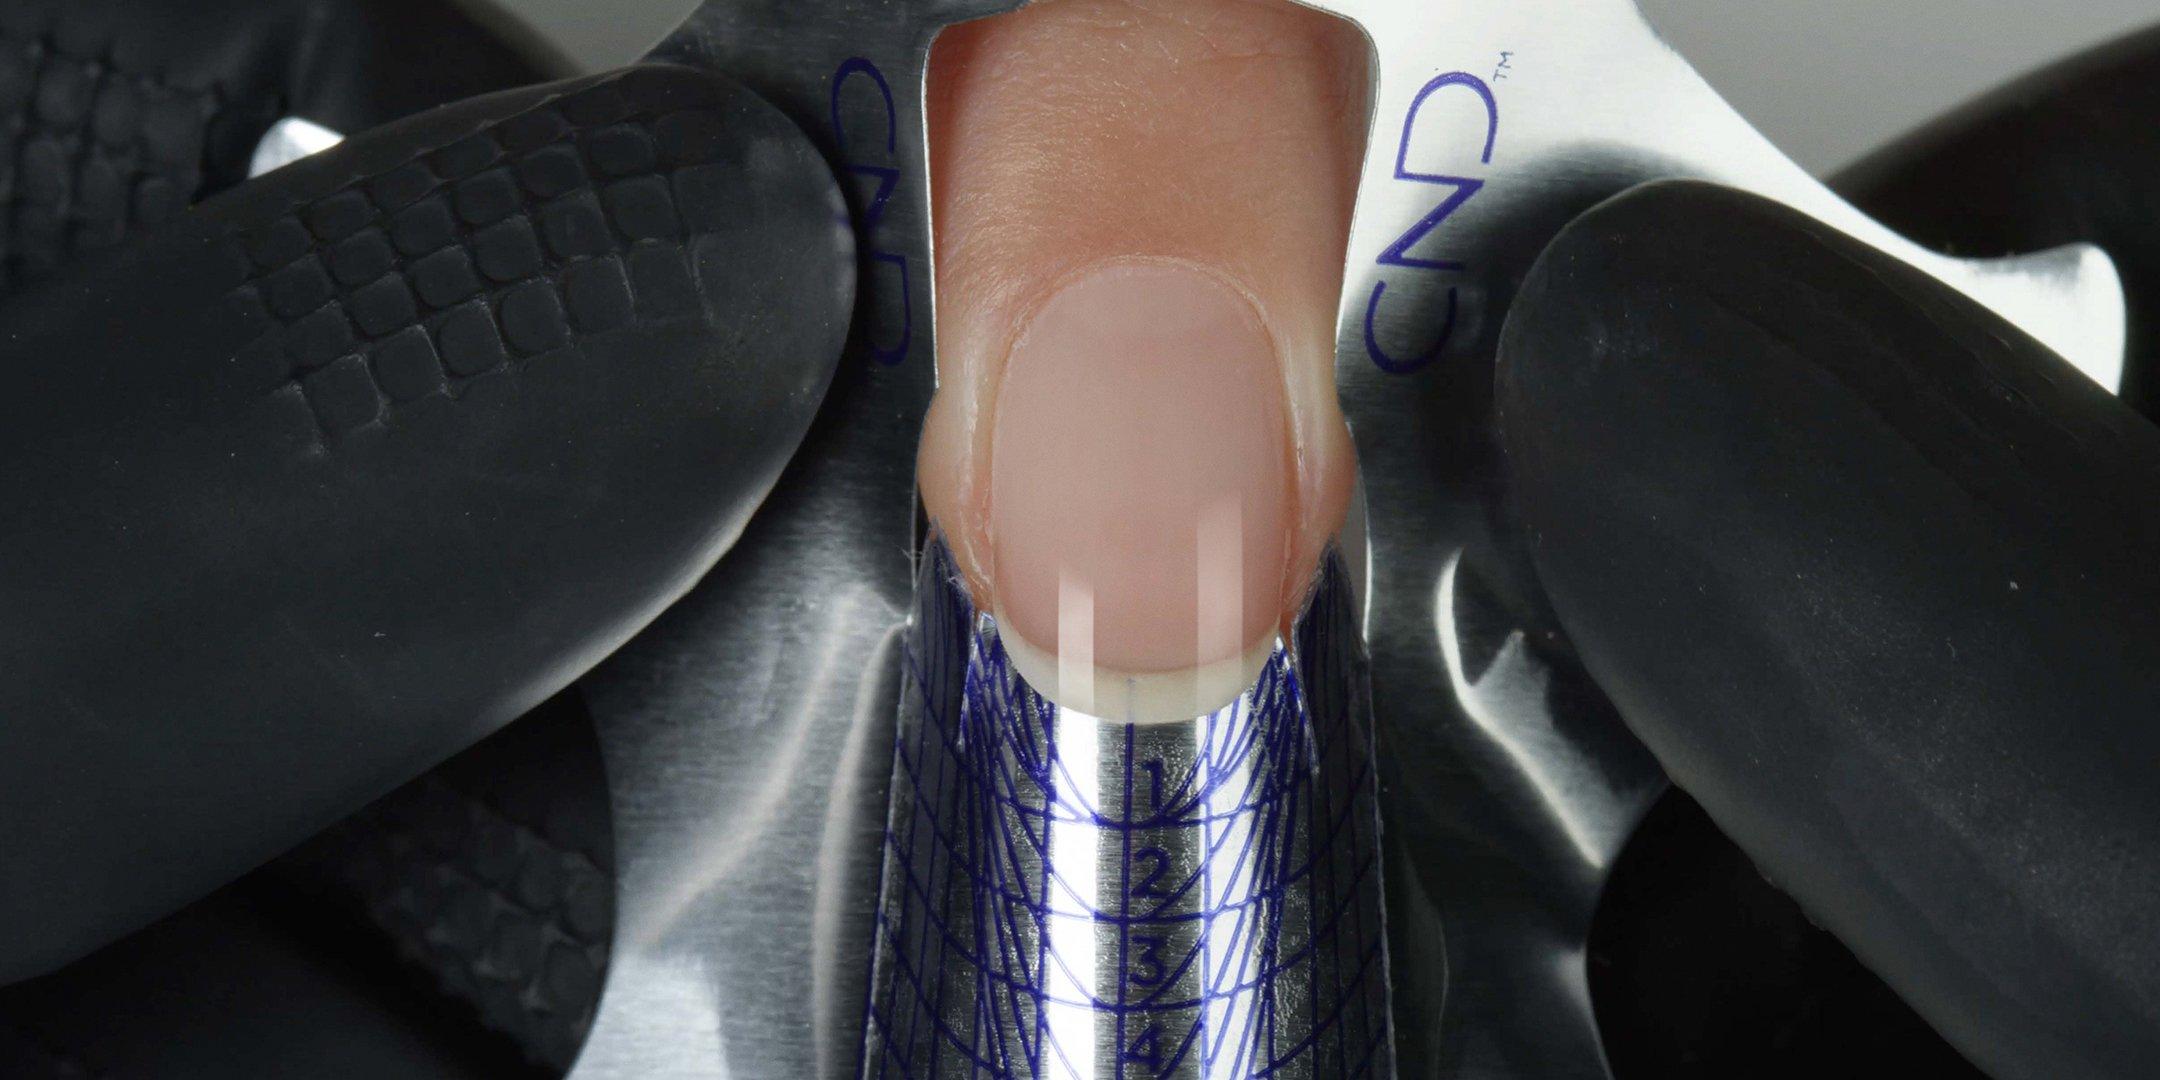 Nails_Proper-Form-Placing_Webinar_Online_Header_2160x1080